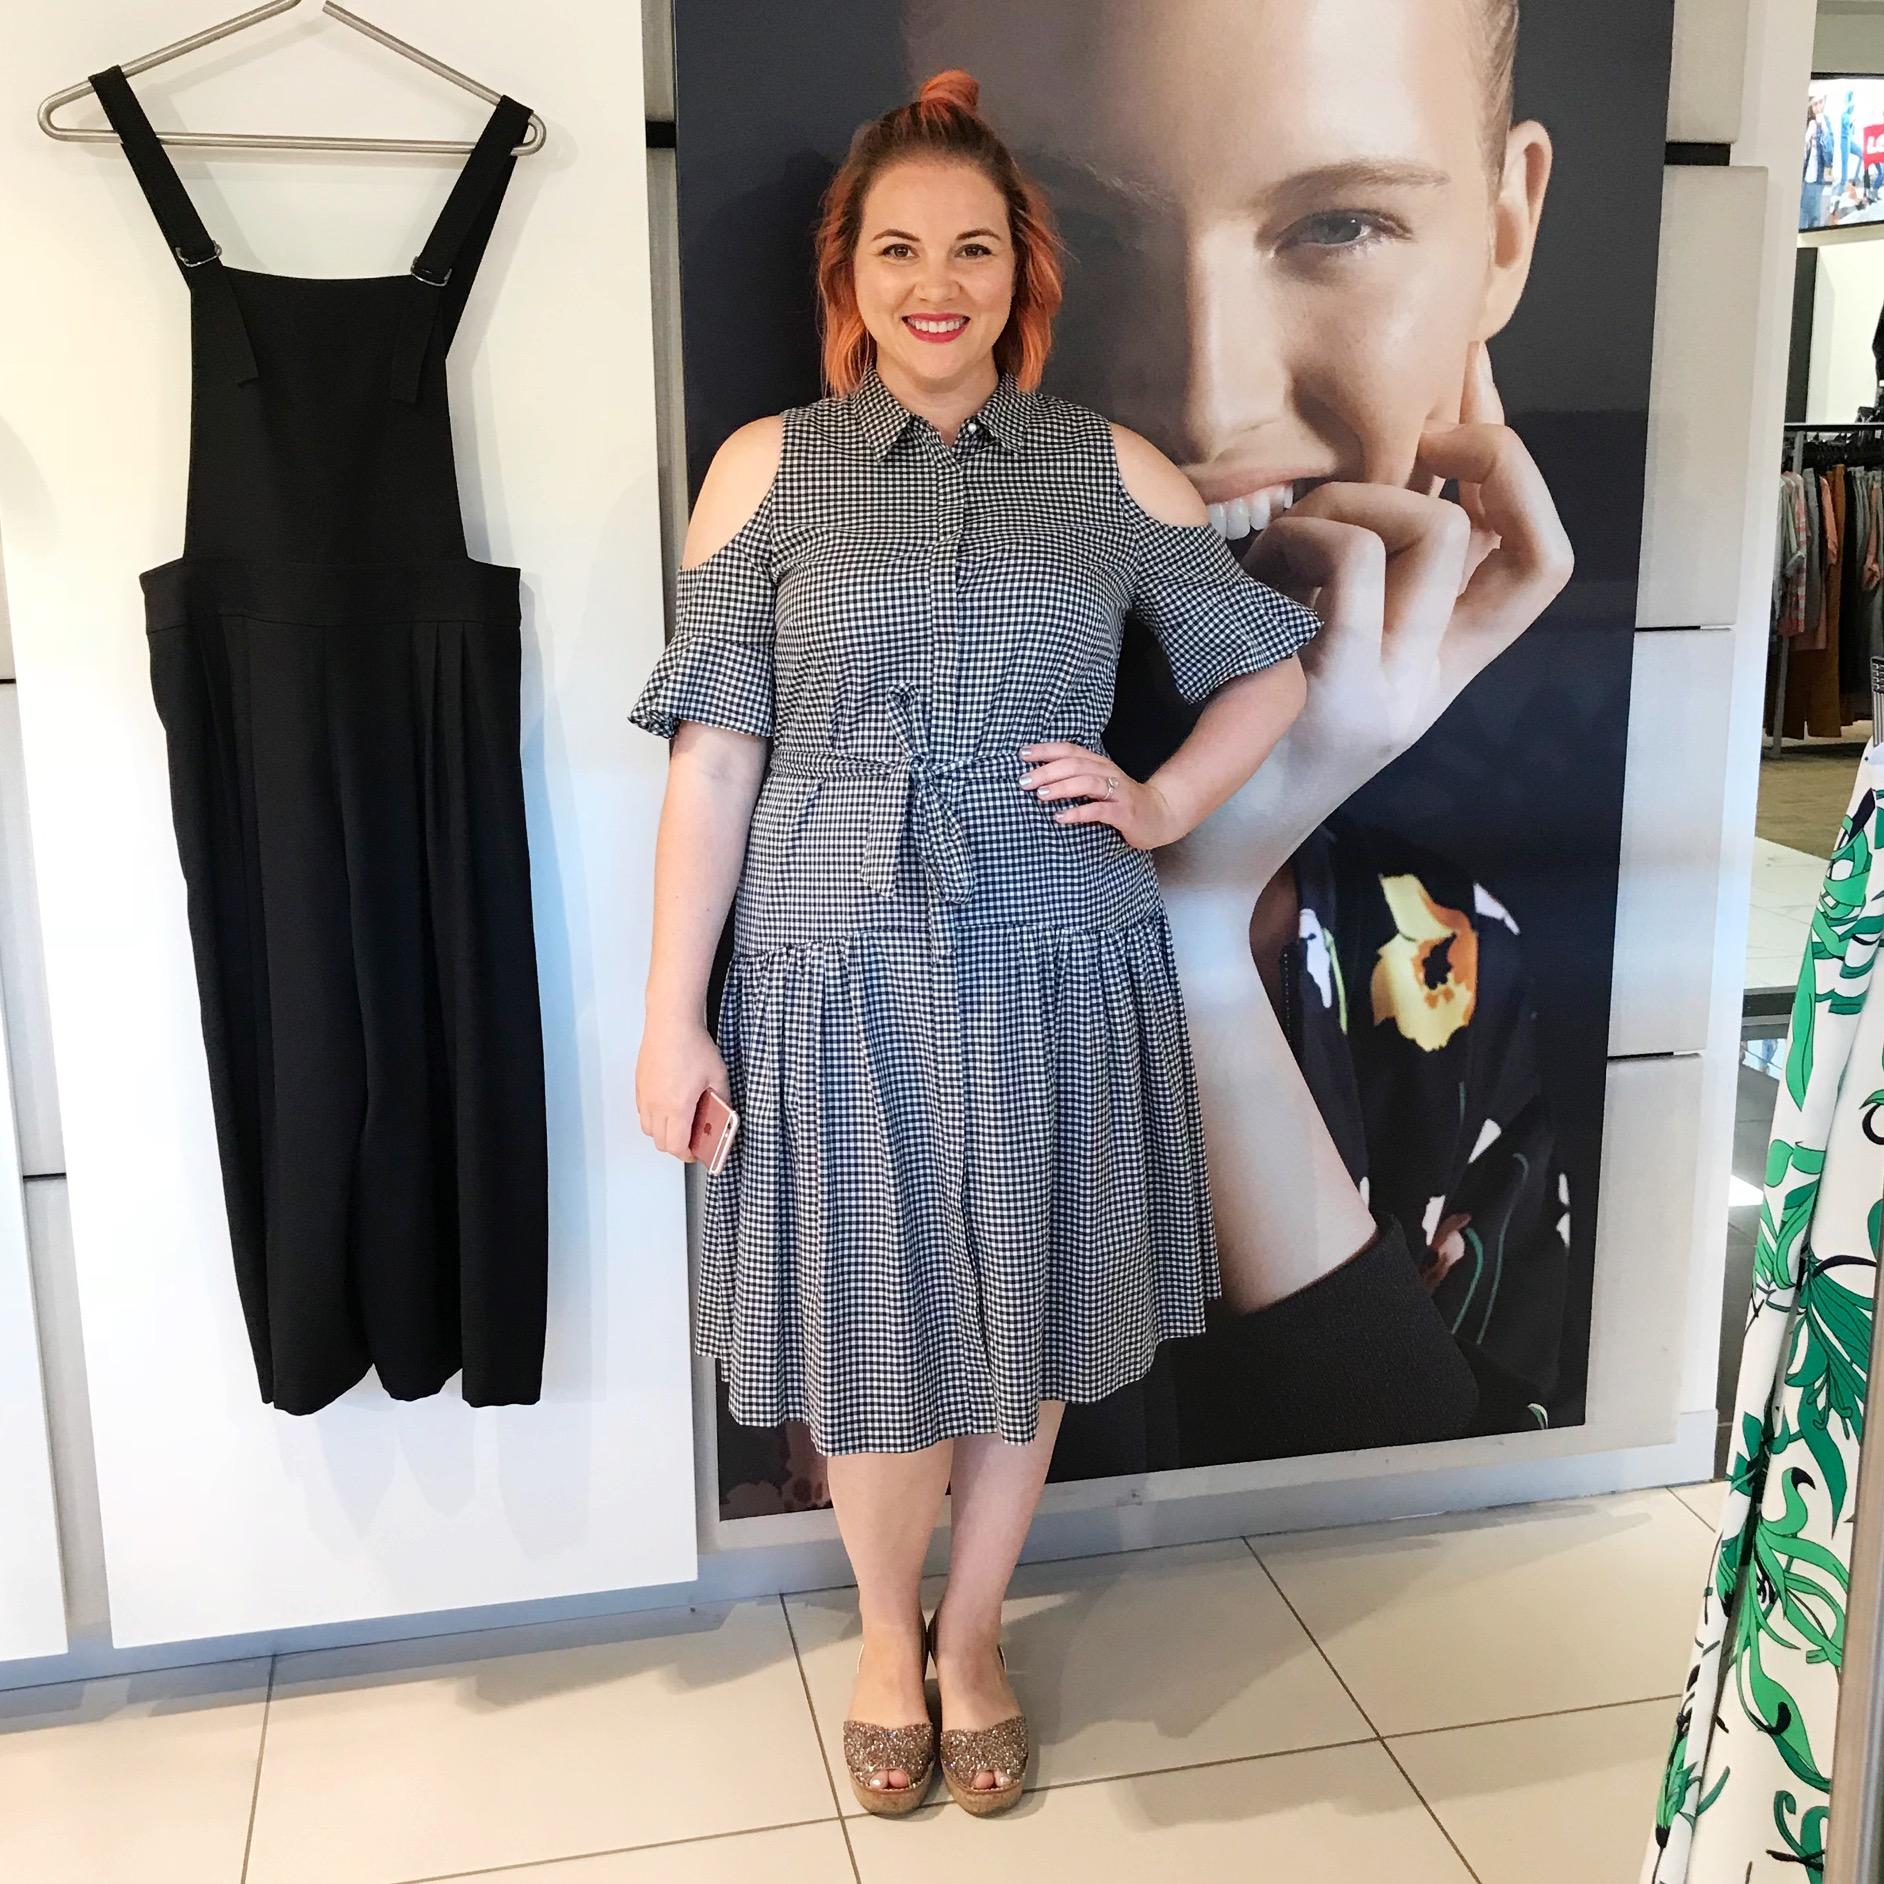 Veronika Maine dress, Lovelee Soles shoes.